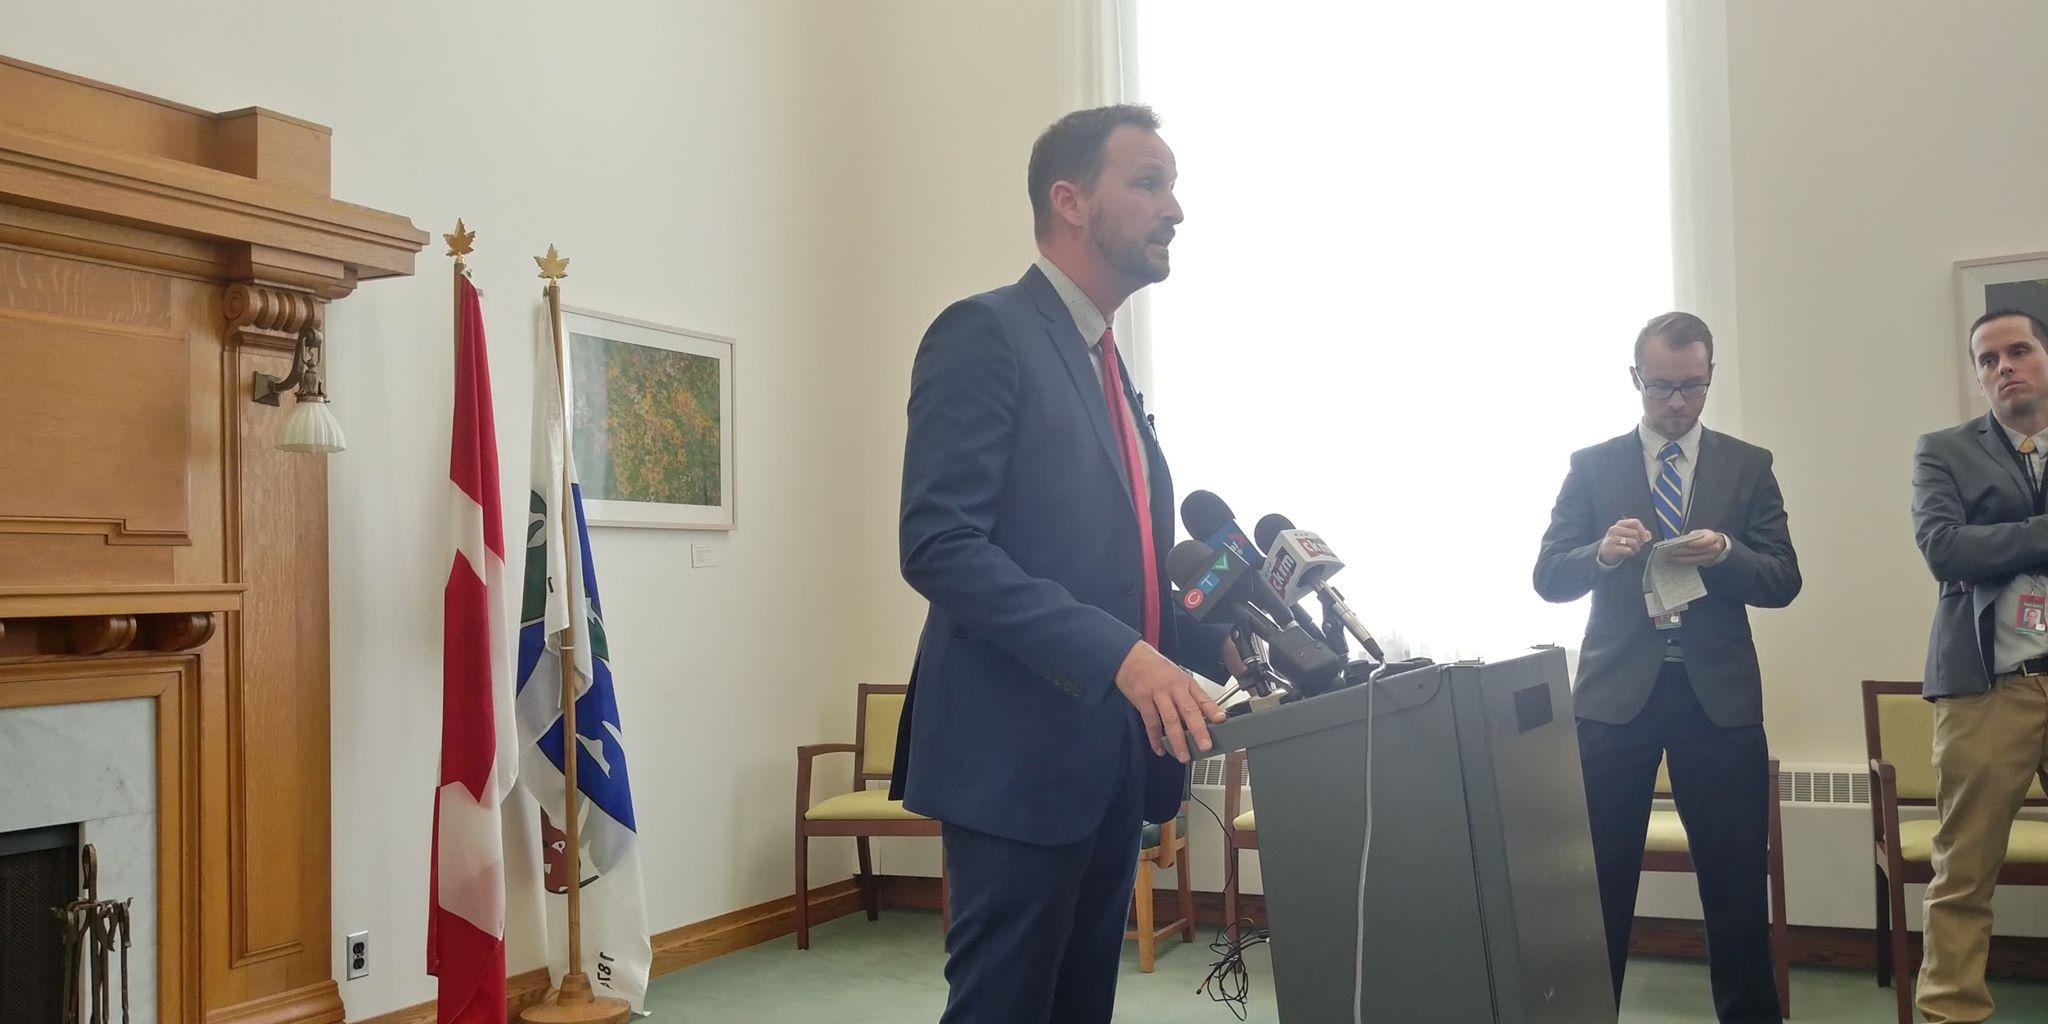 Opposition leader Ryan Meili voices displeasure with throne speech